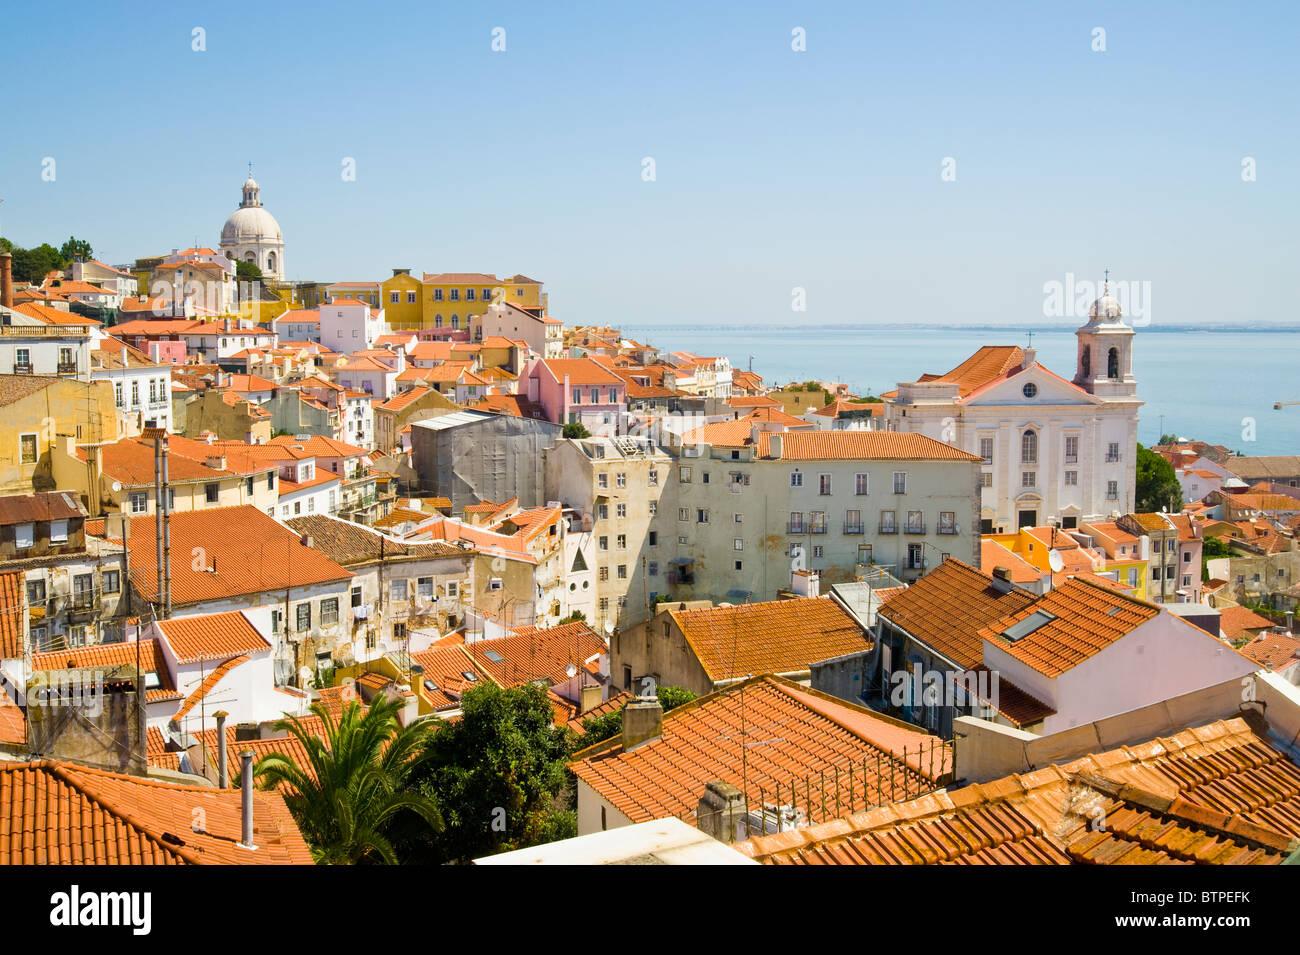 Rooftops, Alfama, Lisbon, Portugal - Stock Image